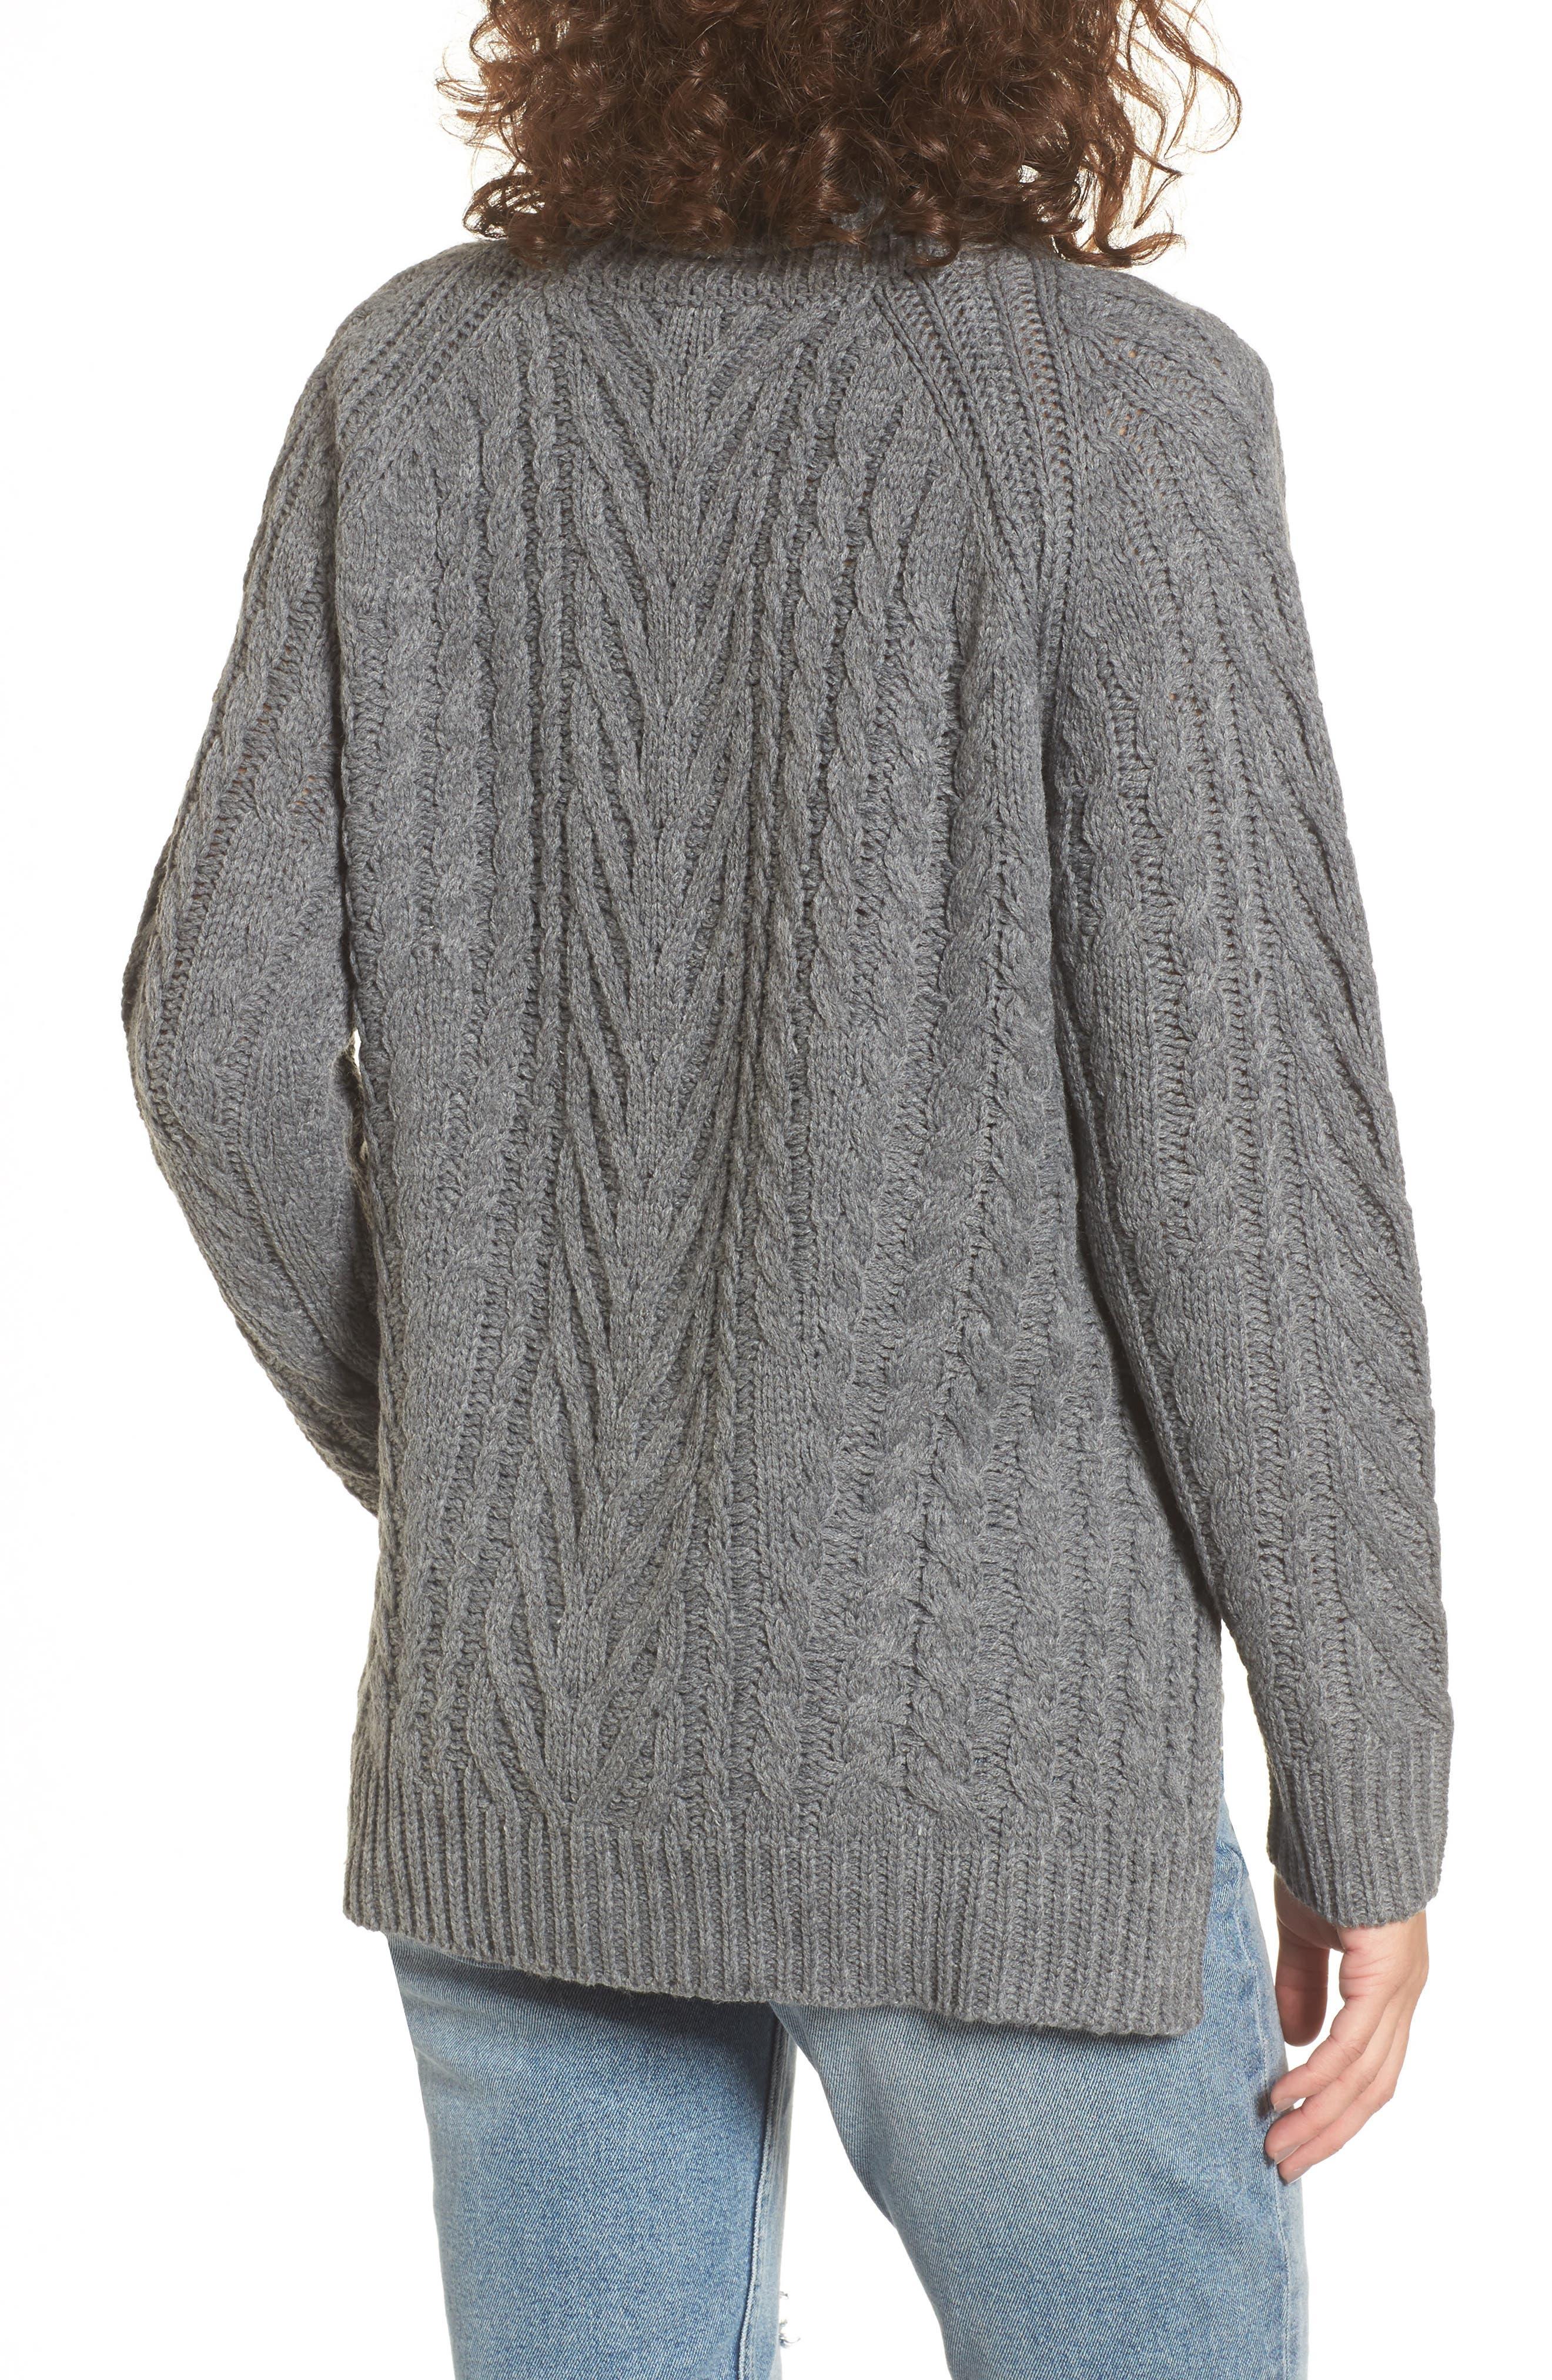 Cable Knit Turtleneck Sweater,                             Alternate thumbnail 2, color,                             020